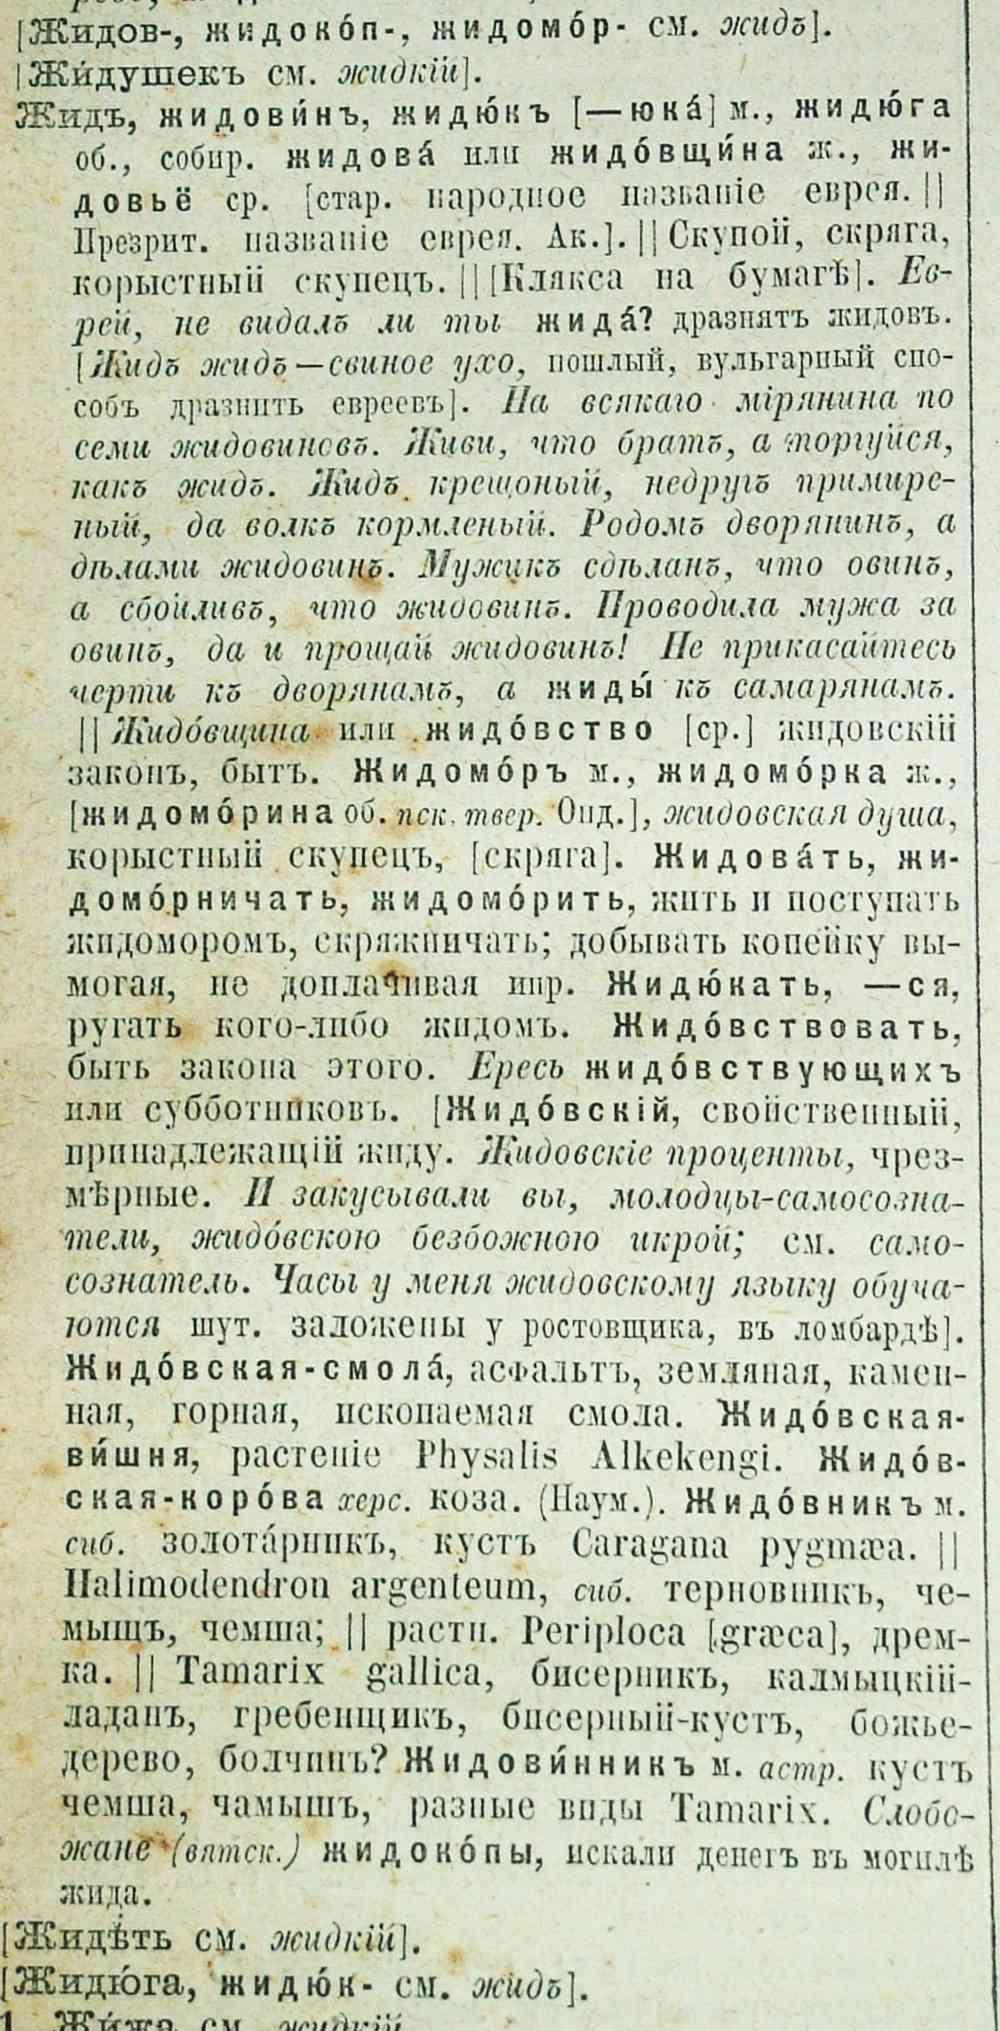 blyad-tolkoviy-slovar